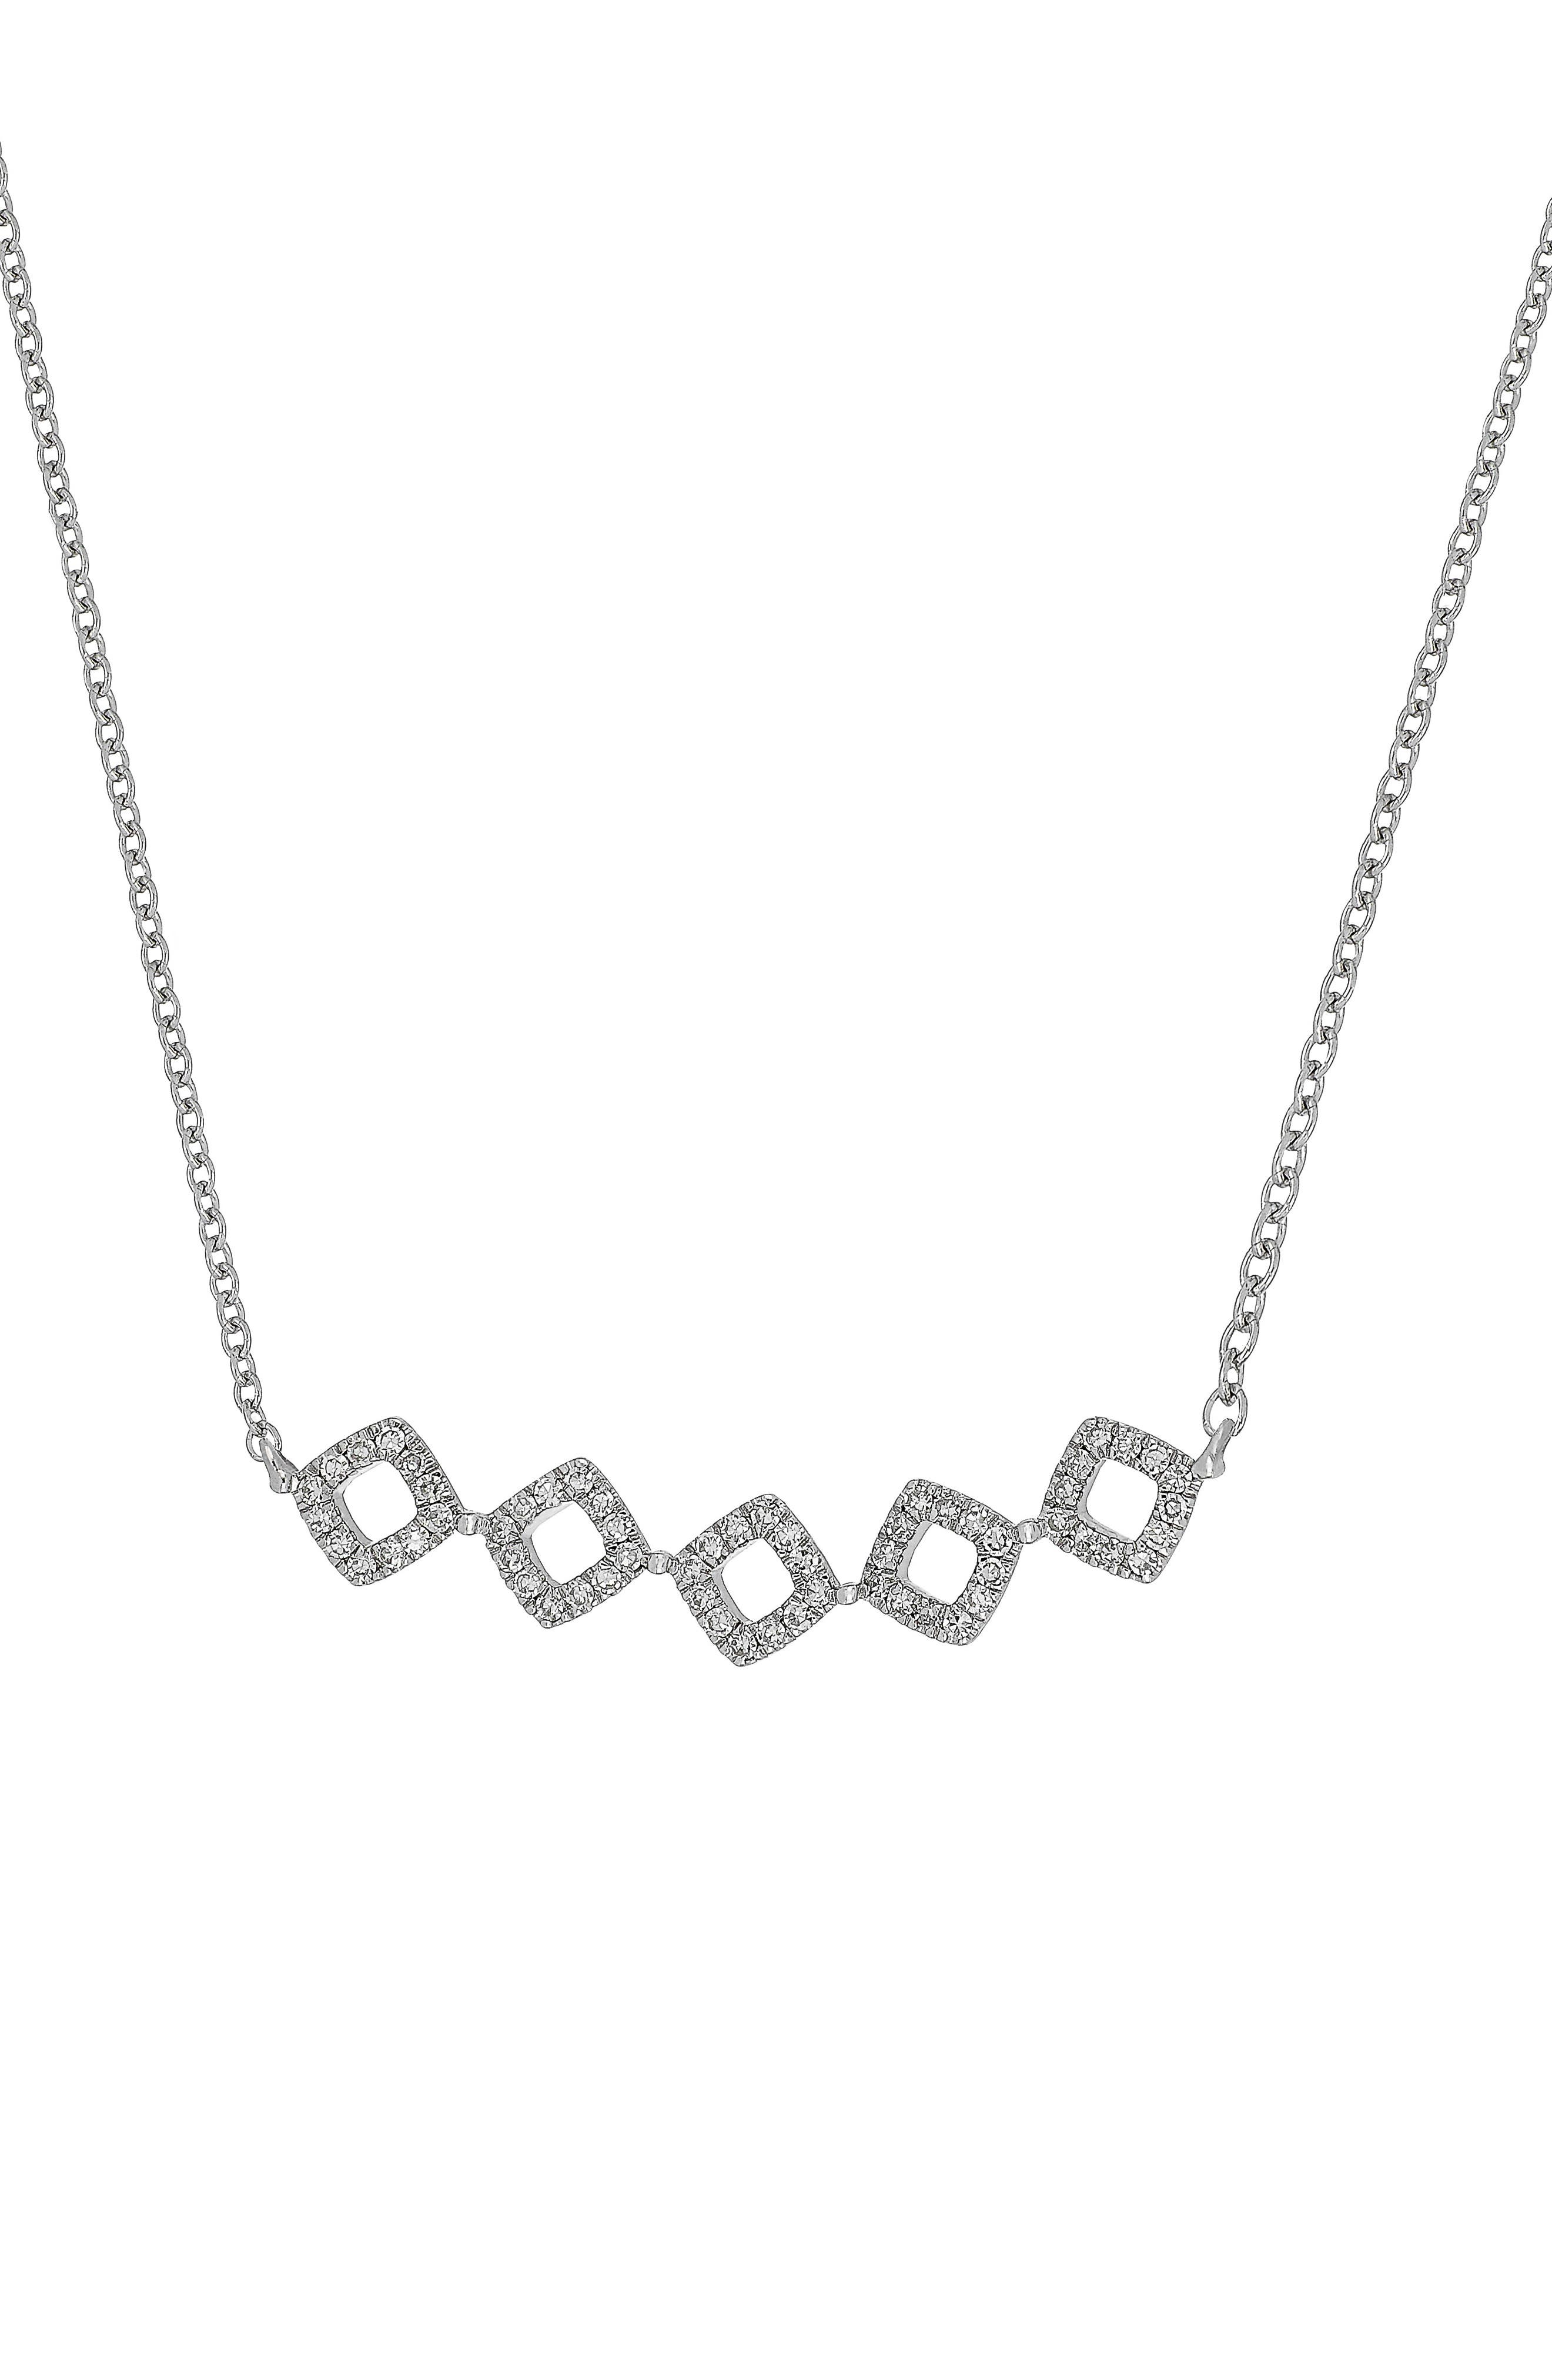 Carrière Diamond Shape Frontal Necklace,                         Main,                         color, SILVER/ DIAMOND